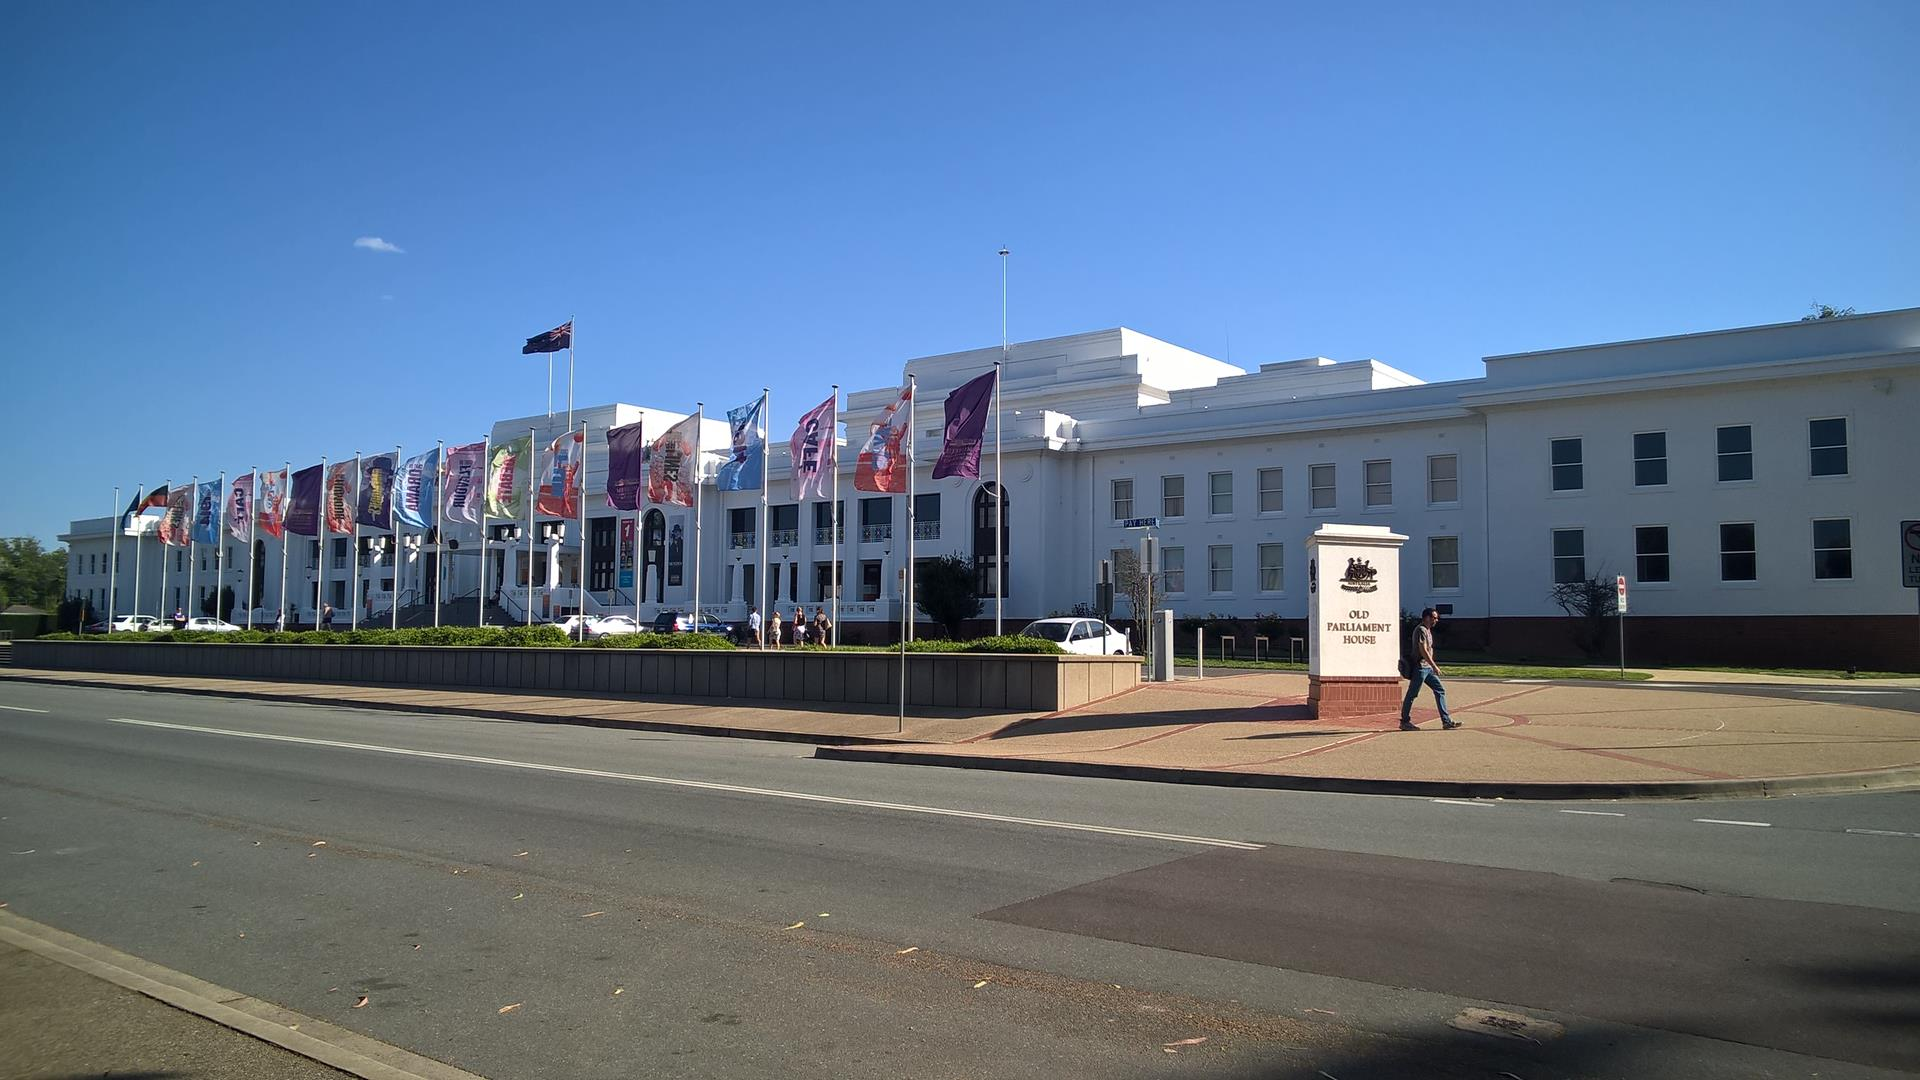 Das alte Parlament